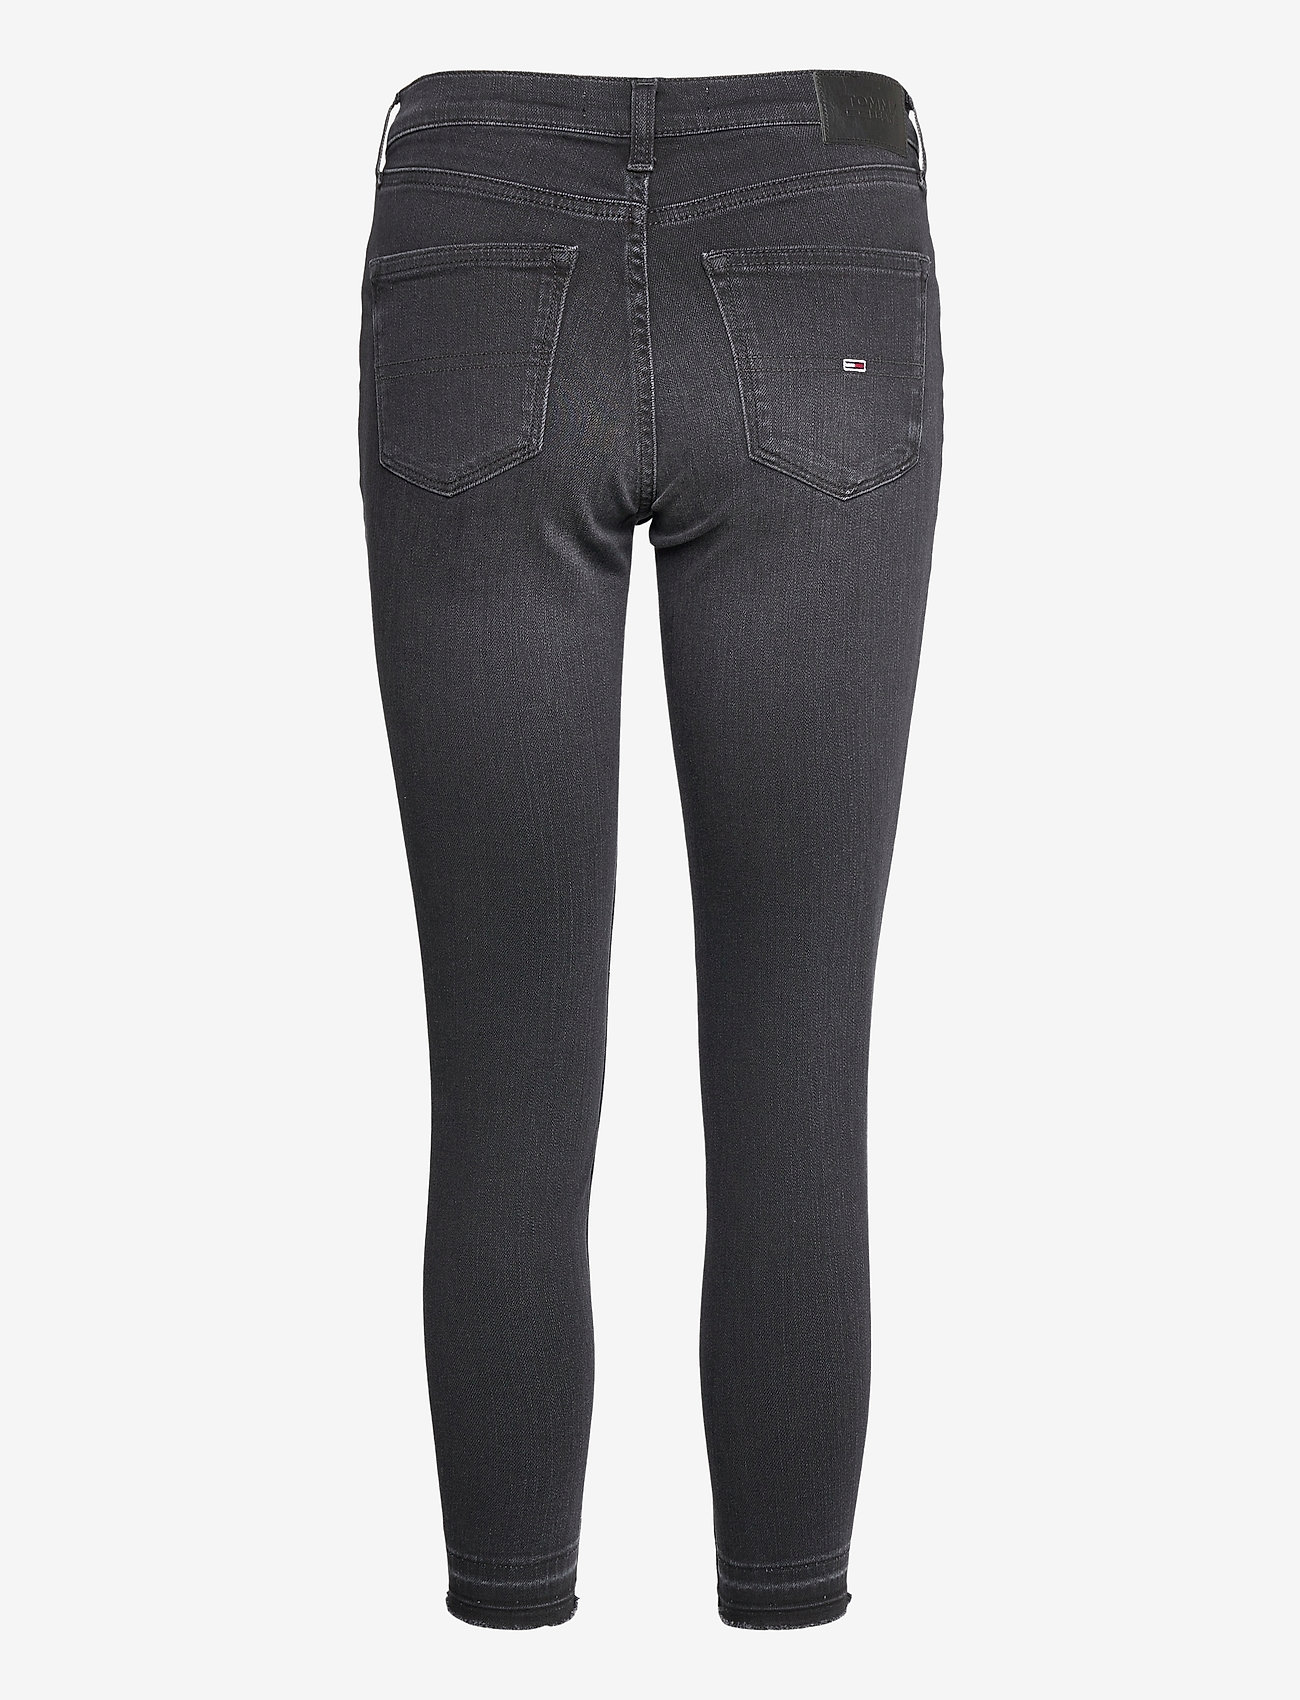 Tommy Jeans - NORA MR SKNY ANKLE  CSBBS - skinny jeans - ceasar bk bk str - 1